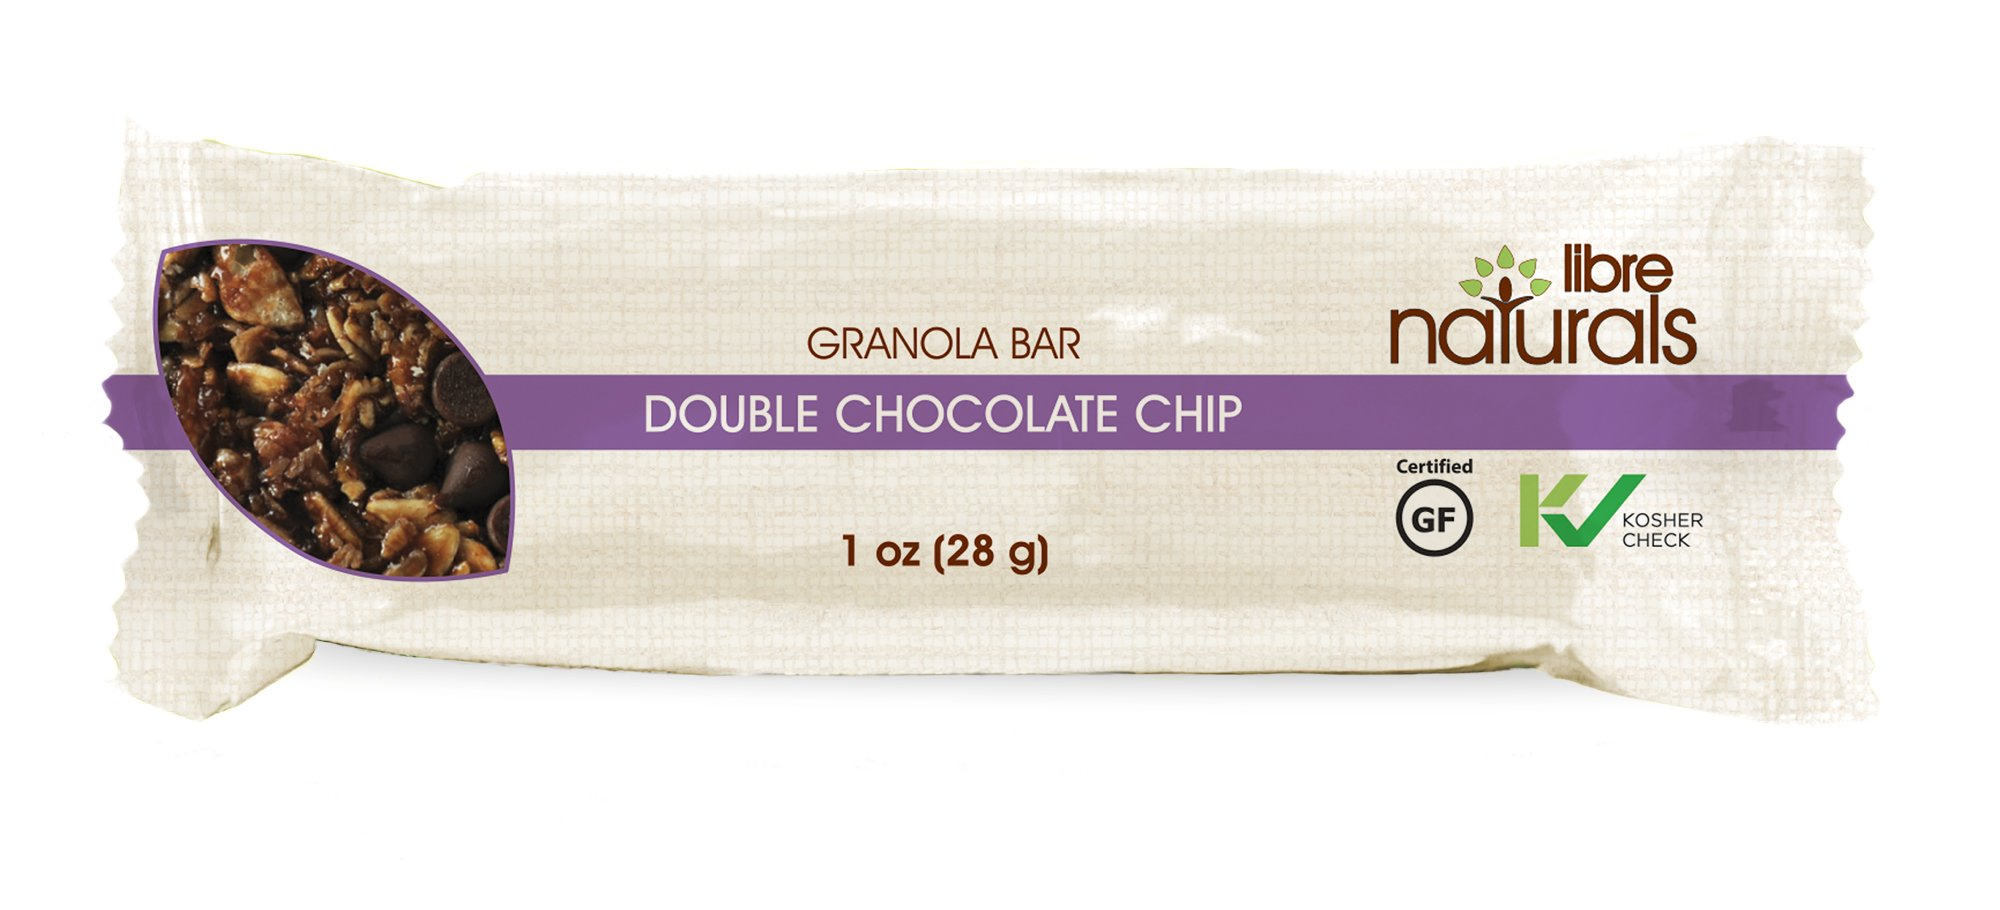 Nut Free, Gluten Free >> Double Chocolate Chip Vegan Granola Bar - Libre Naturals, 28 gram, 100 Bar Bulk Case